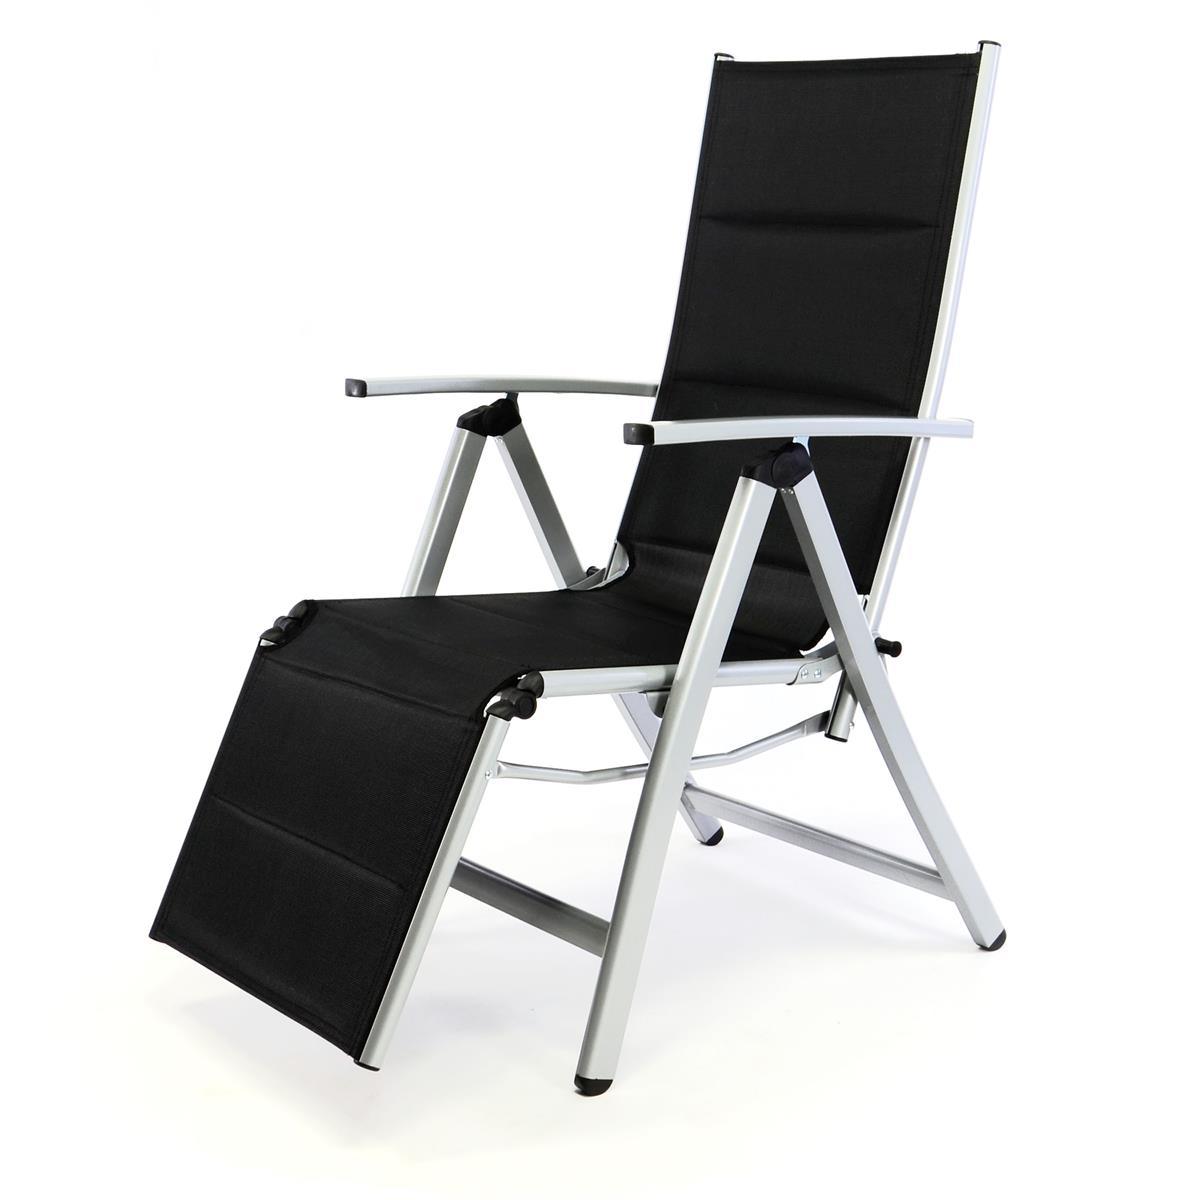 DELUXE Alu Liegestuhl Klappstuhl gepolstert mit Fußstütze Sonnenliege schwarz